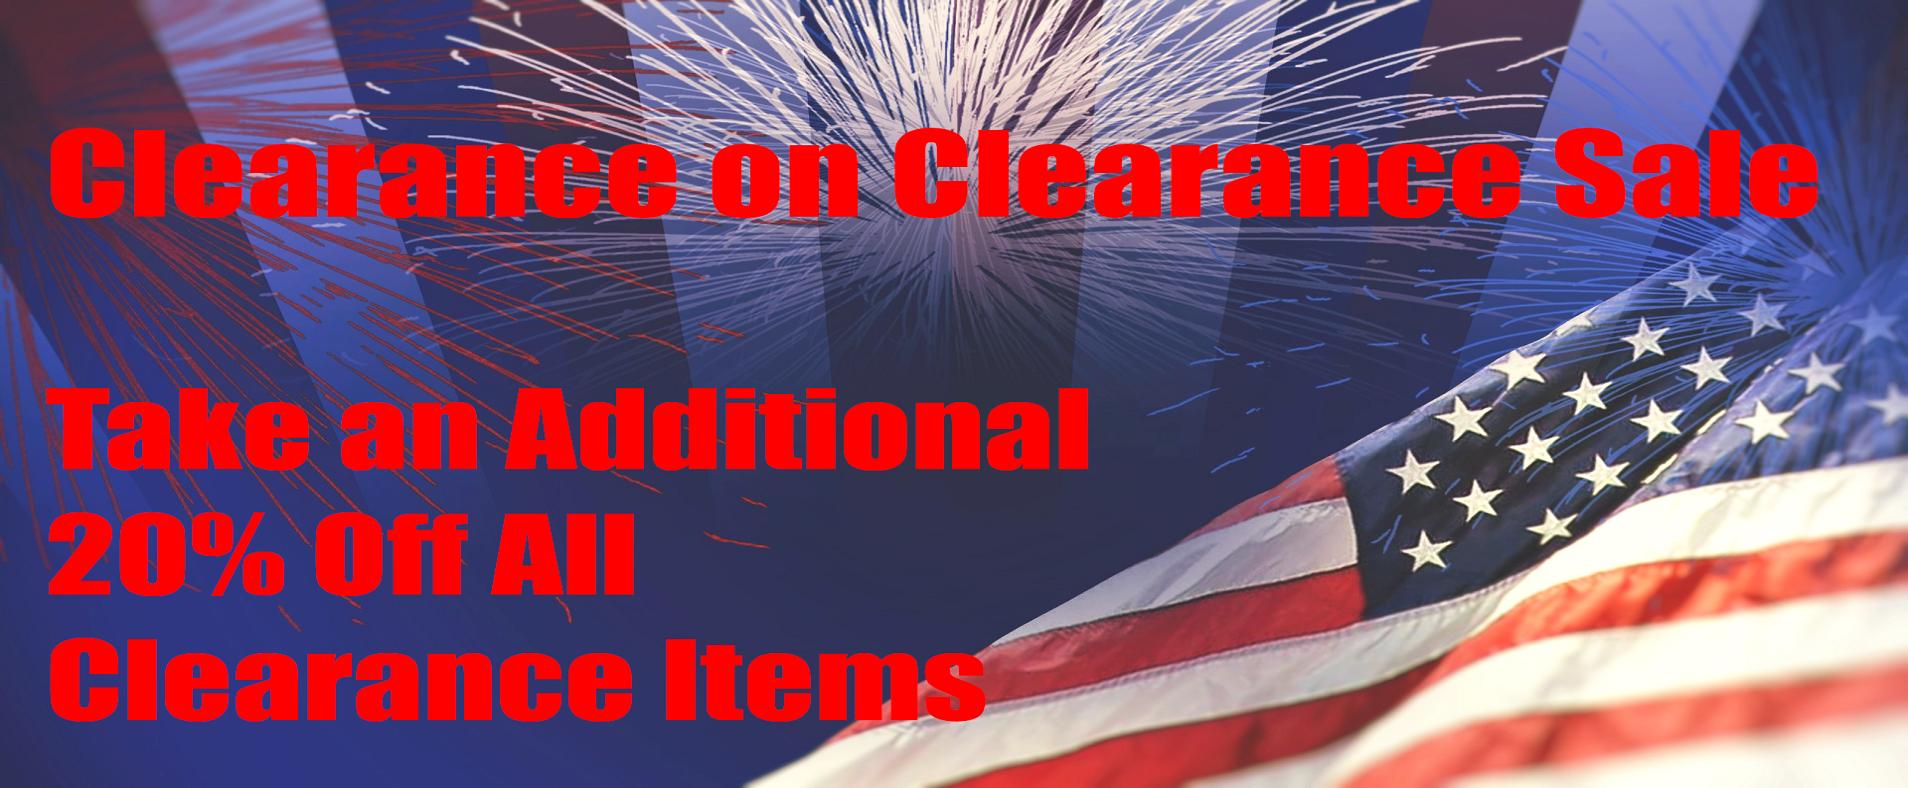 Clearance on Clearance